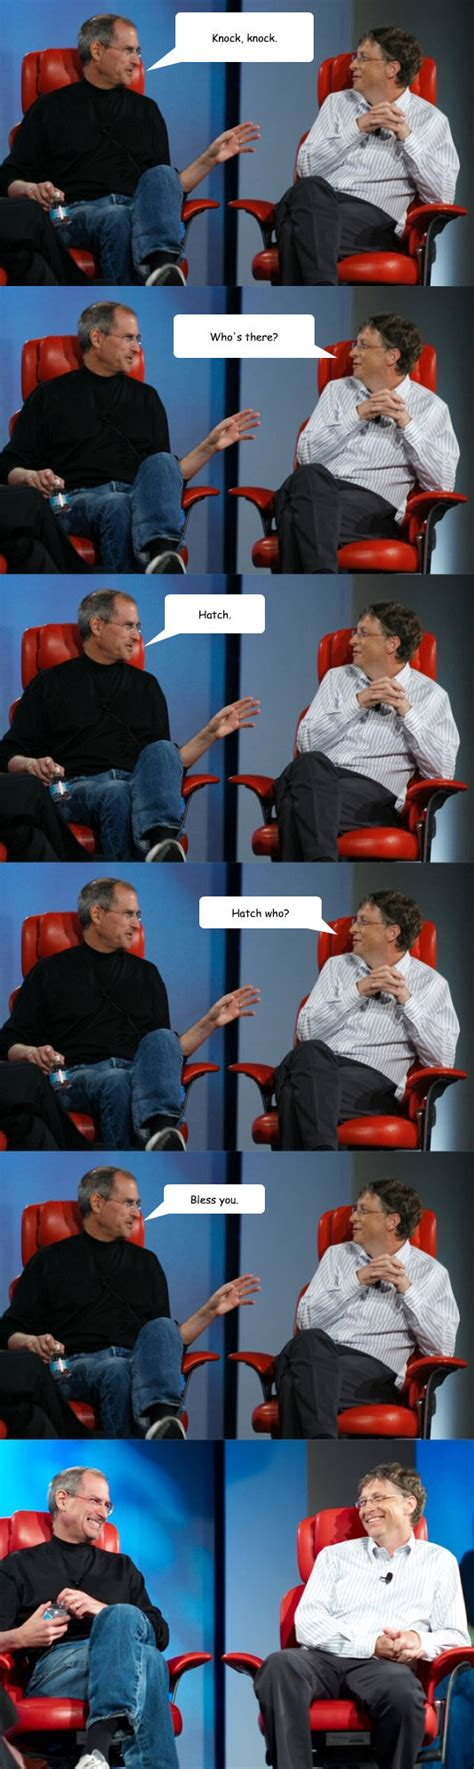 Bill Gates And Steve Jobs Meme - steve jobs and bill gates meme weknowmemes